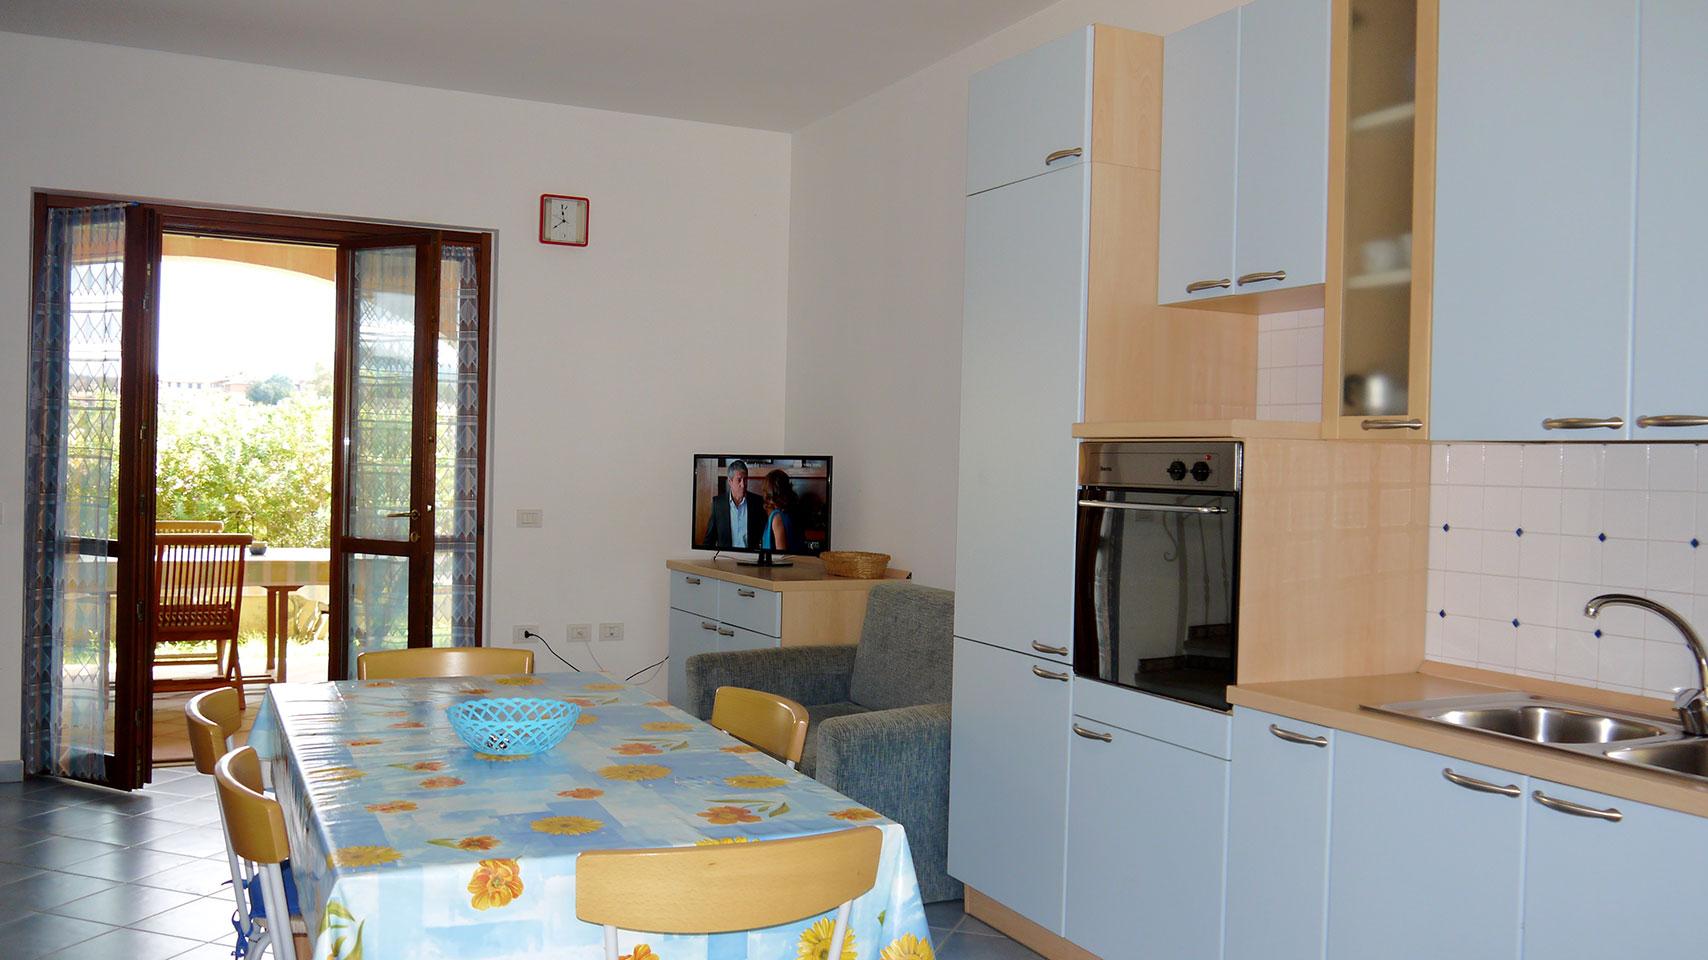 Appartamenti iris villasimius for Appartamenti sardegna